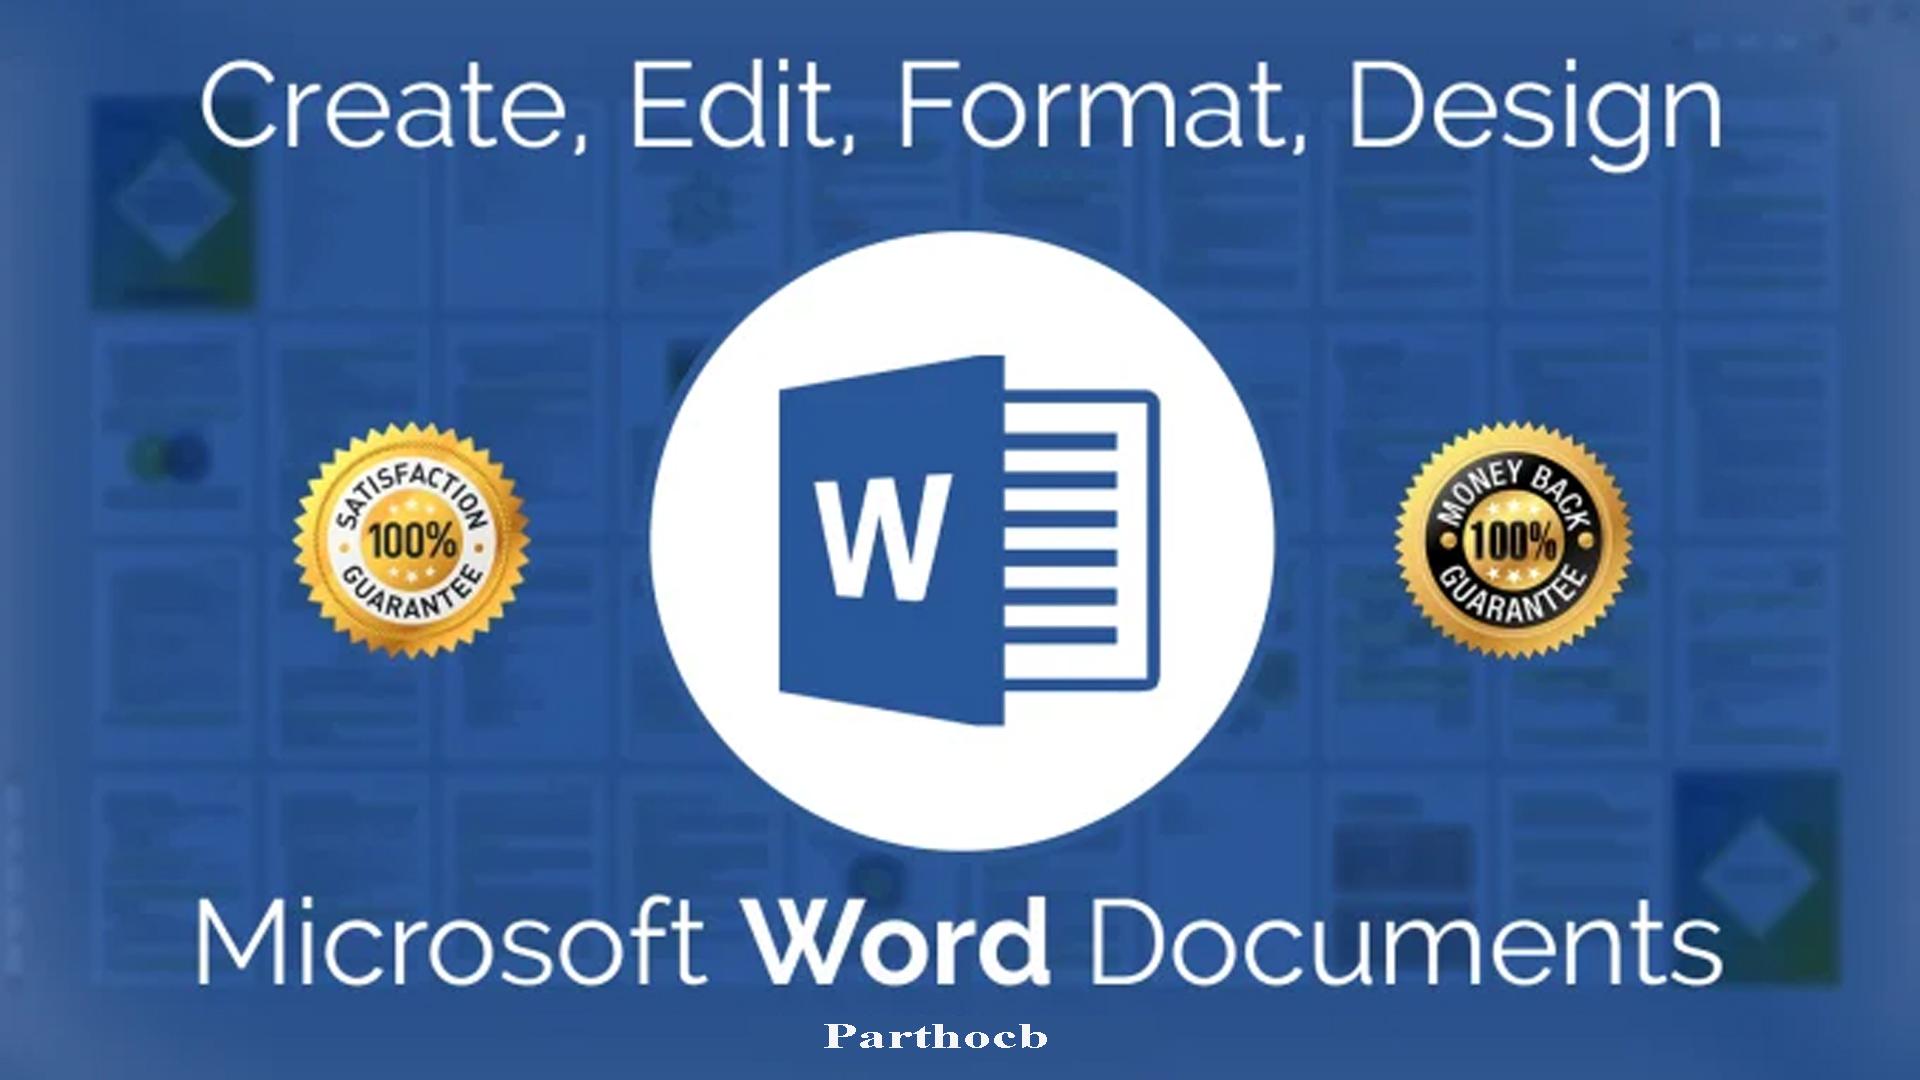 I will create,  edit,  format,  design,  convert microsoft word documents